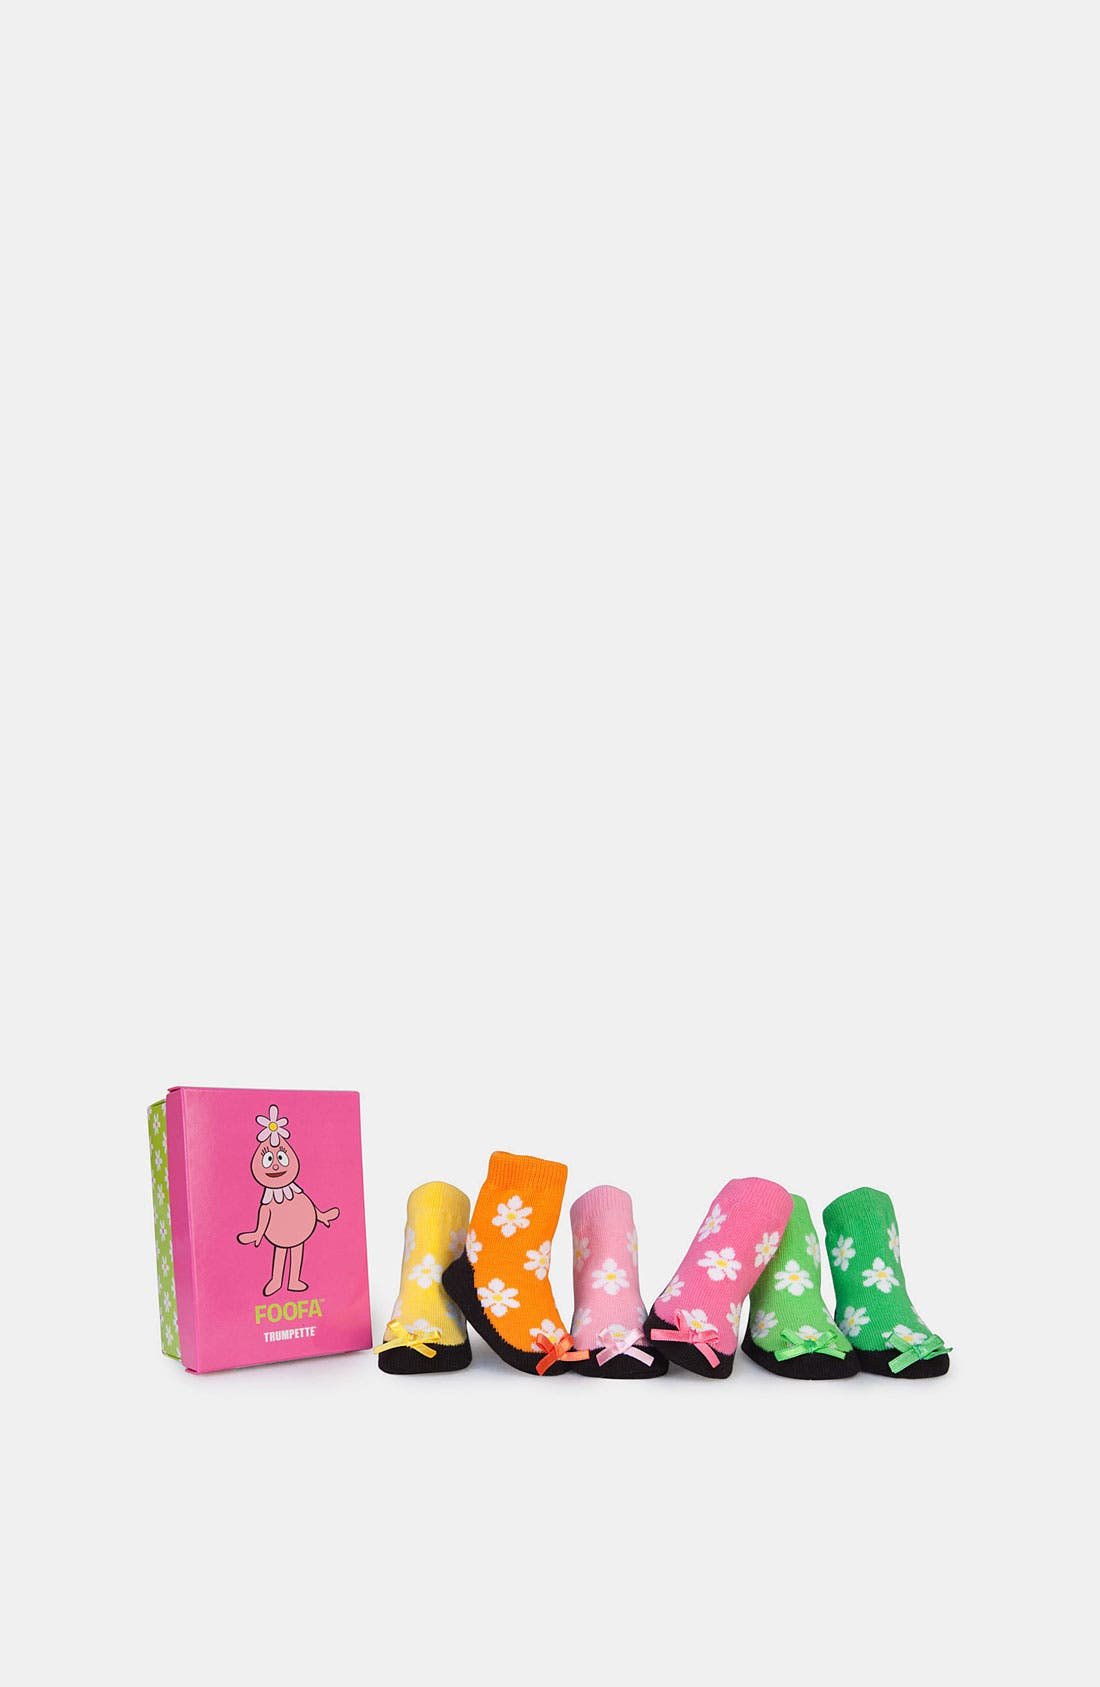 Alternate Image 1 Selected - Trumpette 'Foofa' Socks (6-Pack) (Infant)